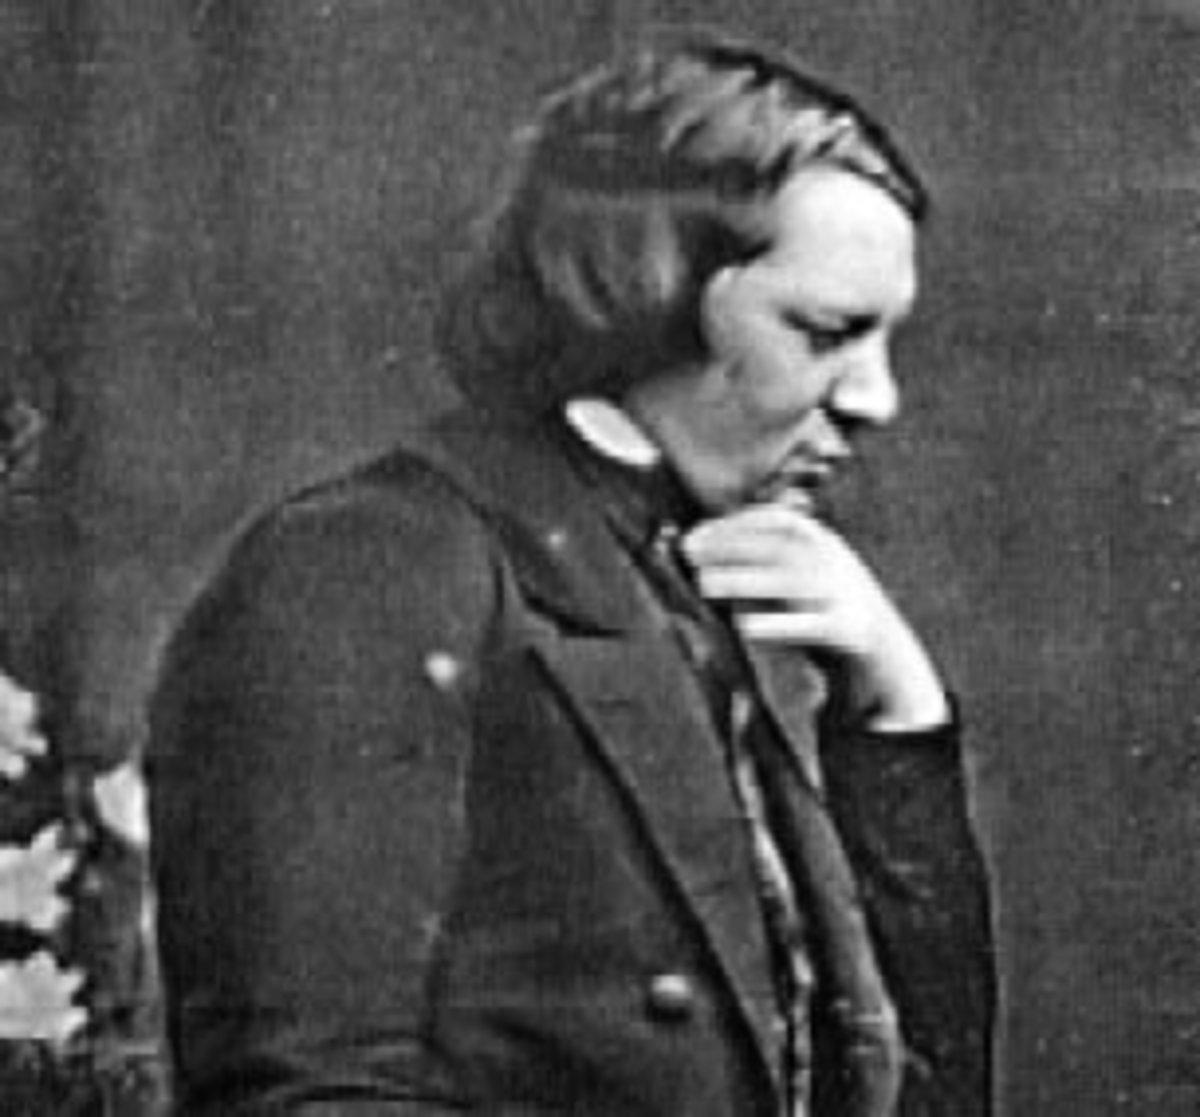 Daguerrotype of Schumann c1850.